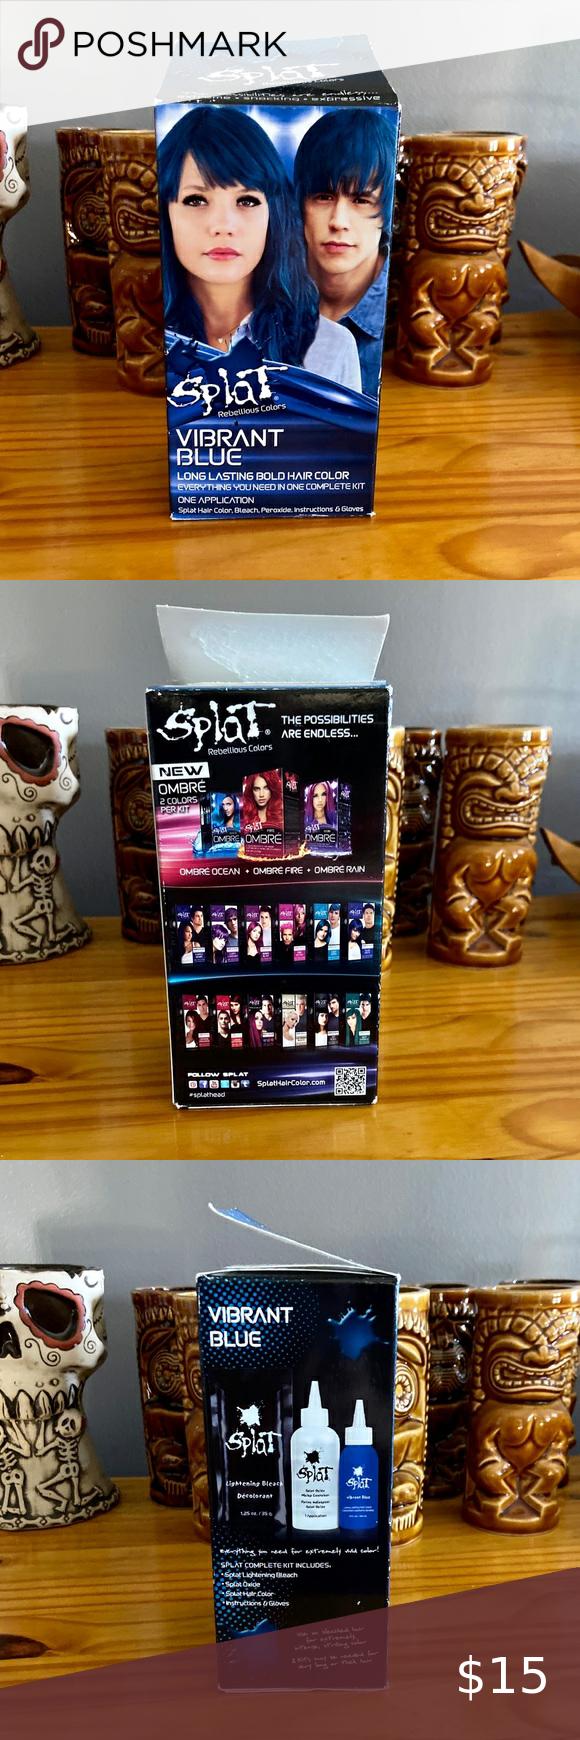 Splat Complete Kit Vibrant Blue Semi Permanent In 2020 Bright Blue Hair Color Kit Splat Colors